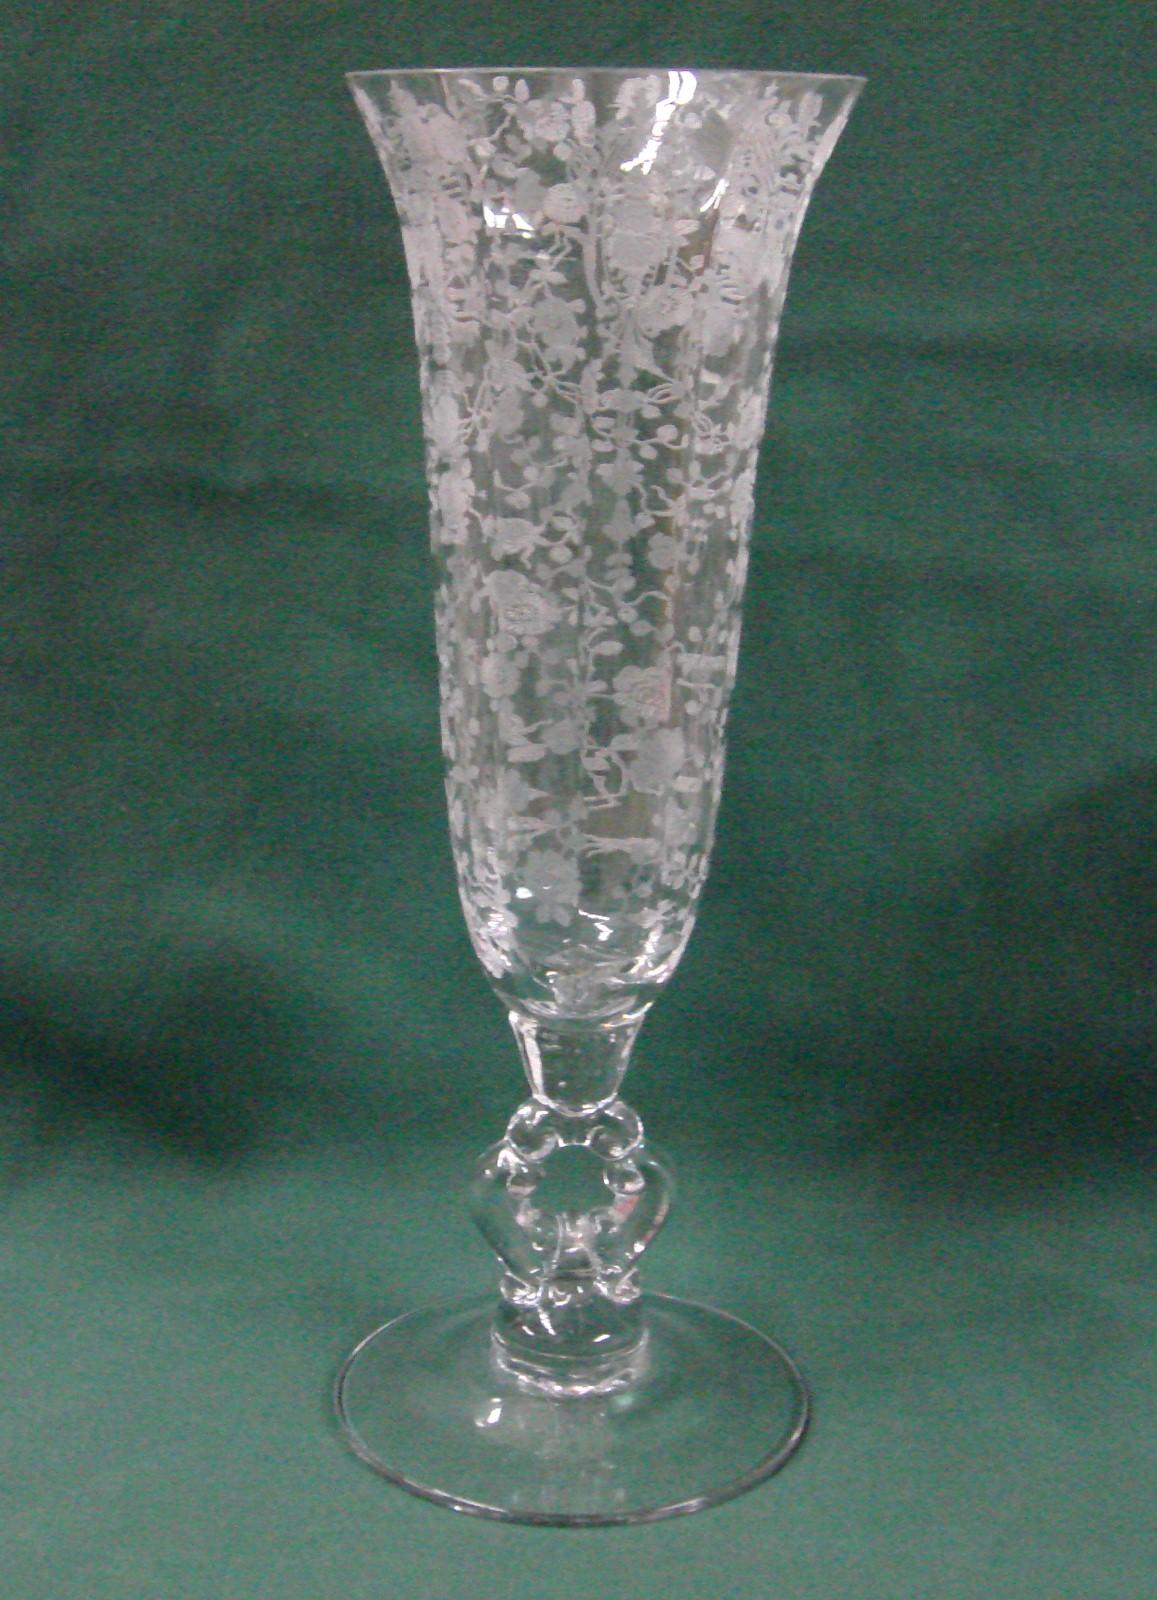 "Best 1237 Wiccan Images On Pinterest: Cambridge ROSE POINT 9-7/8"" Keyhole Vase 1237 BEST!"